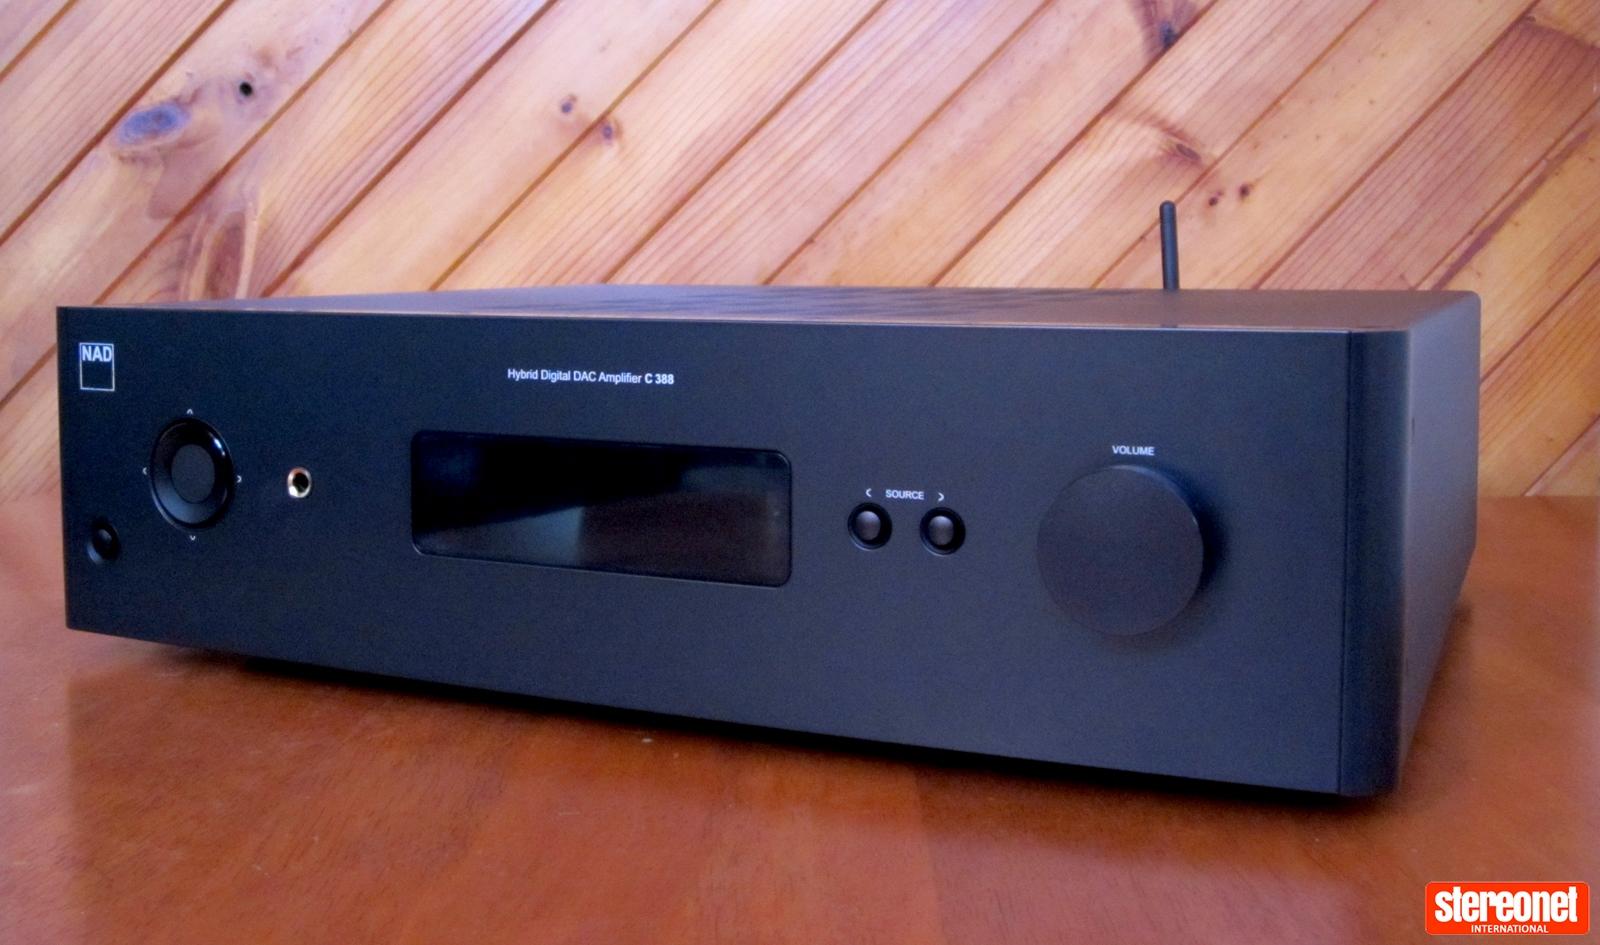 NAD Electronoics C388 Hybrid Digital DAC Amplifier Review